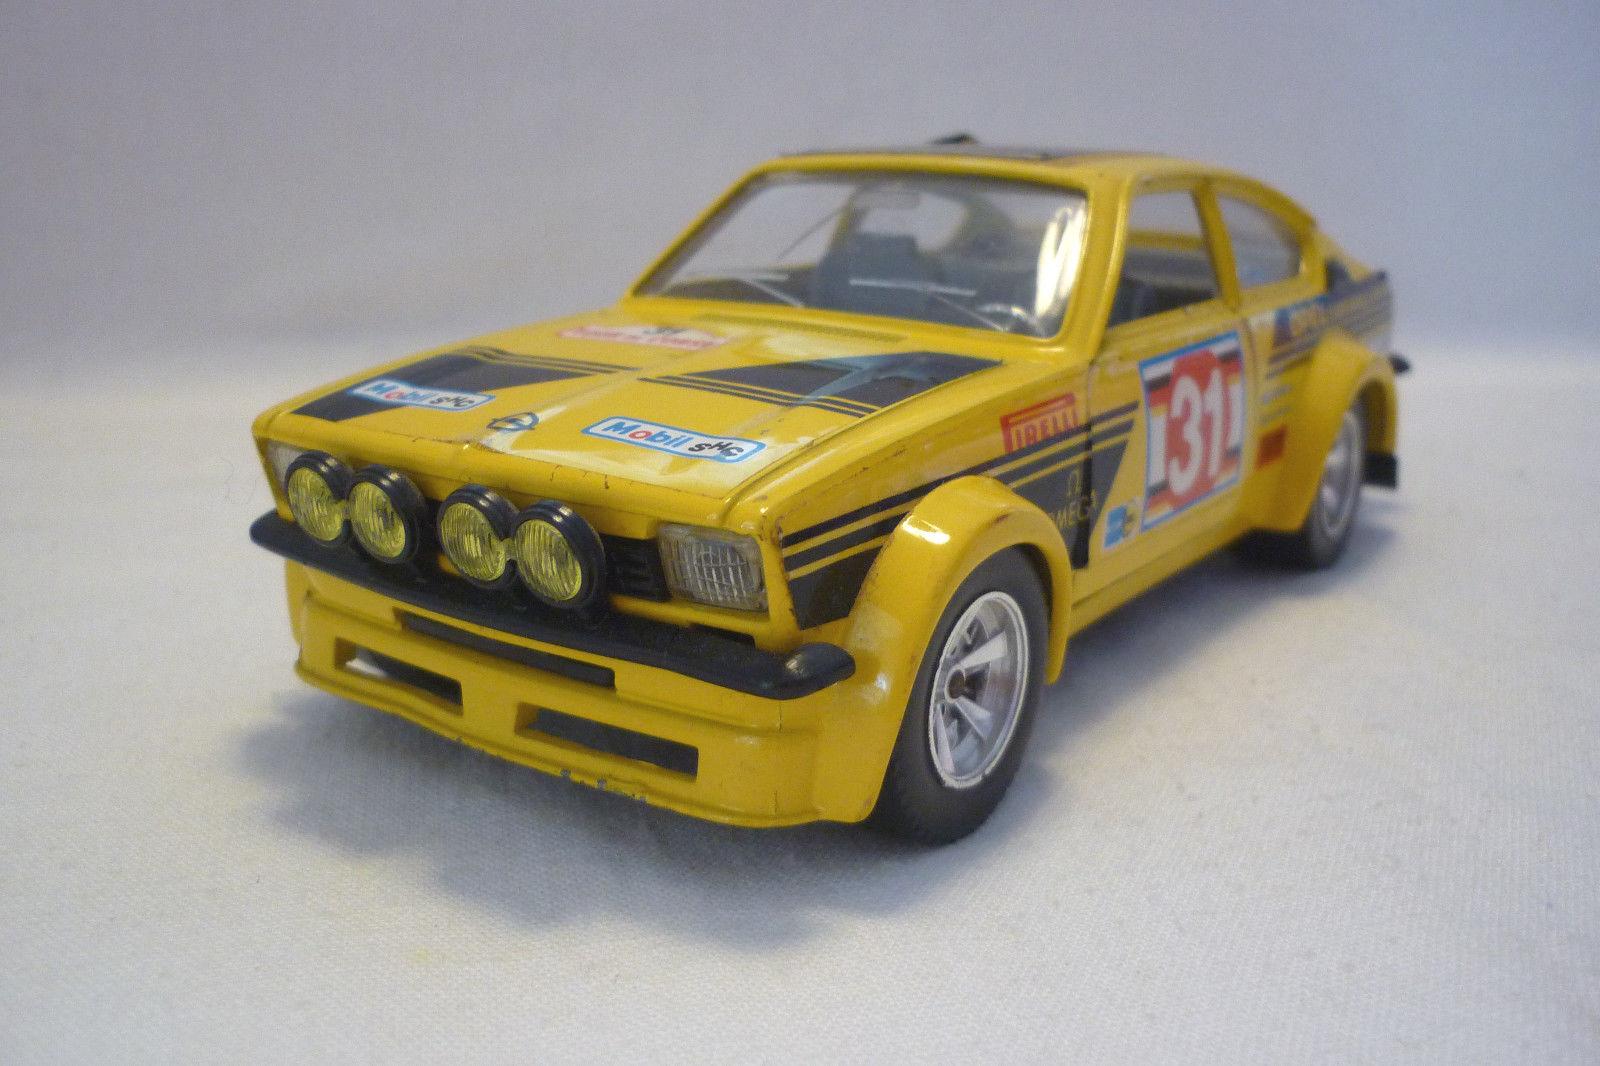 Bburago-Métal modèle-OPEL KADETT GT E Rally  - 1 24 - (5.div-26)  vente discount en ligne